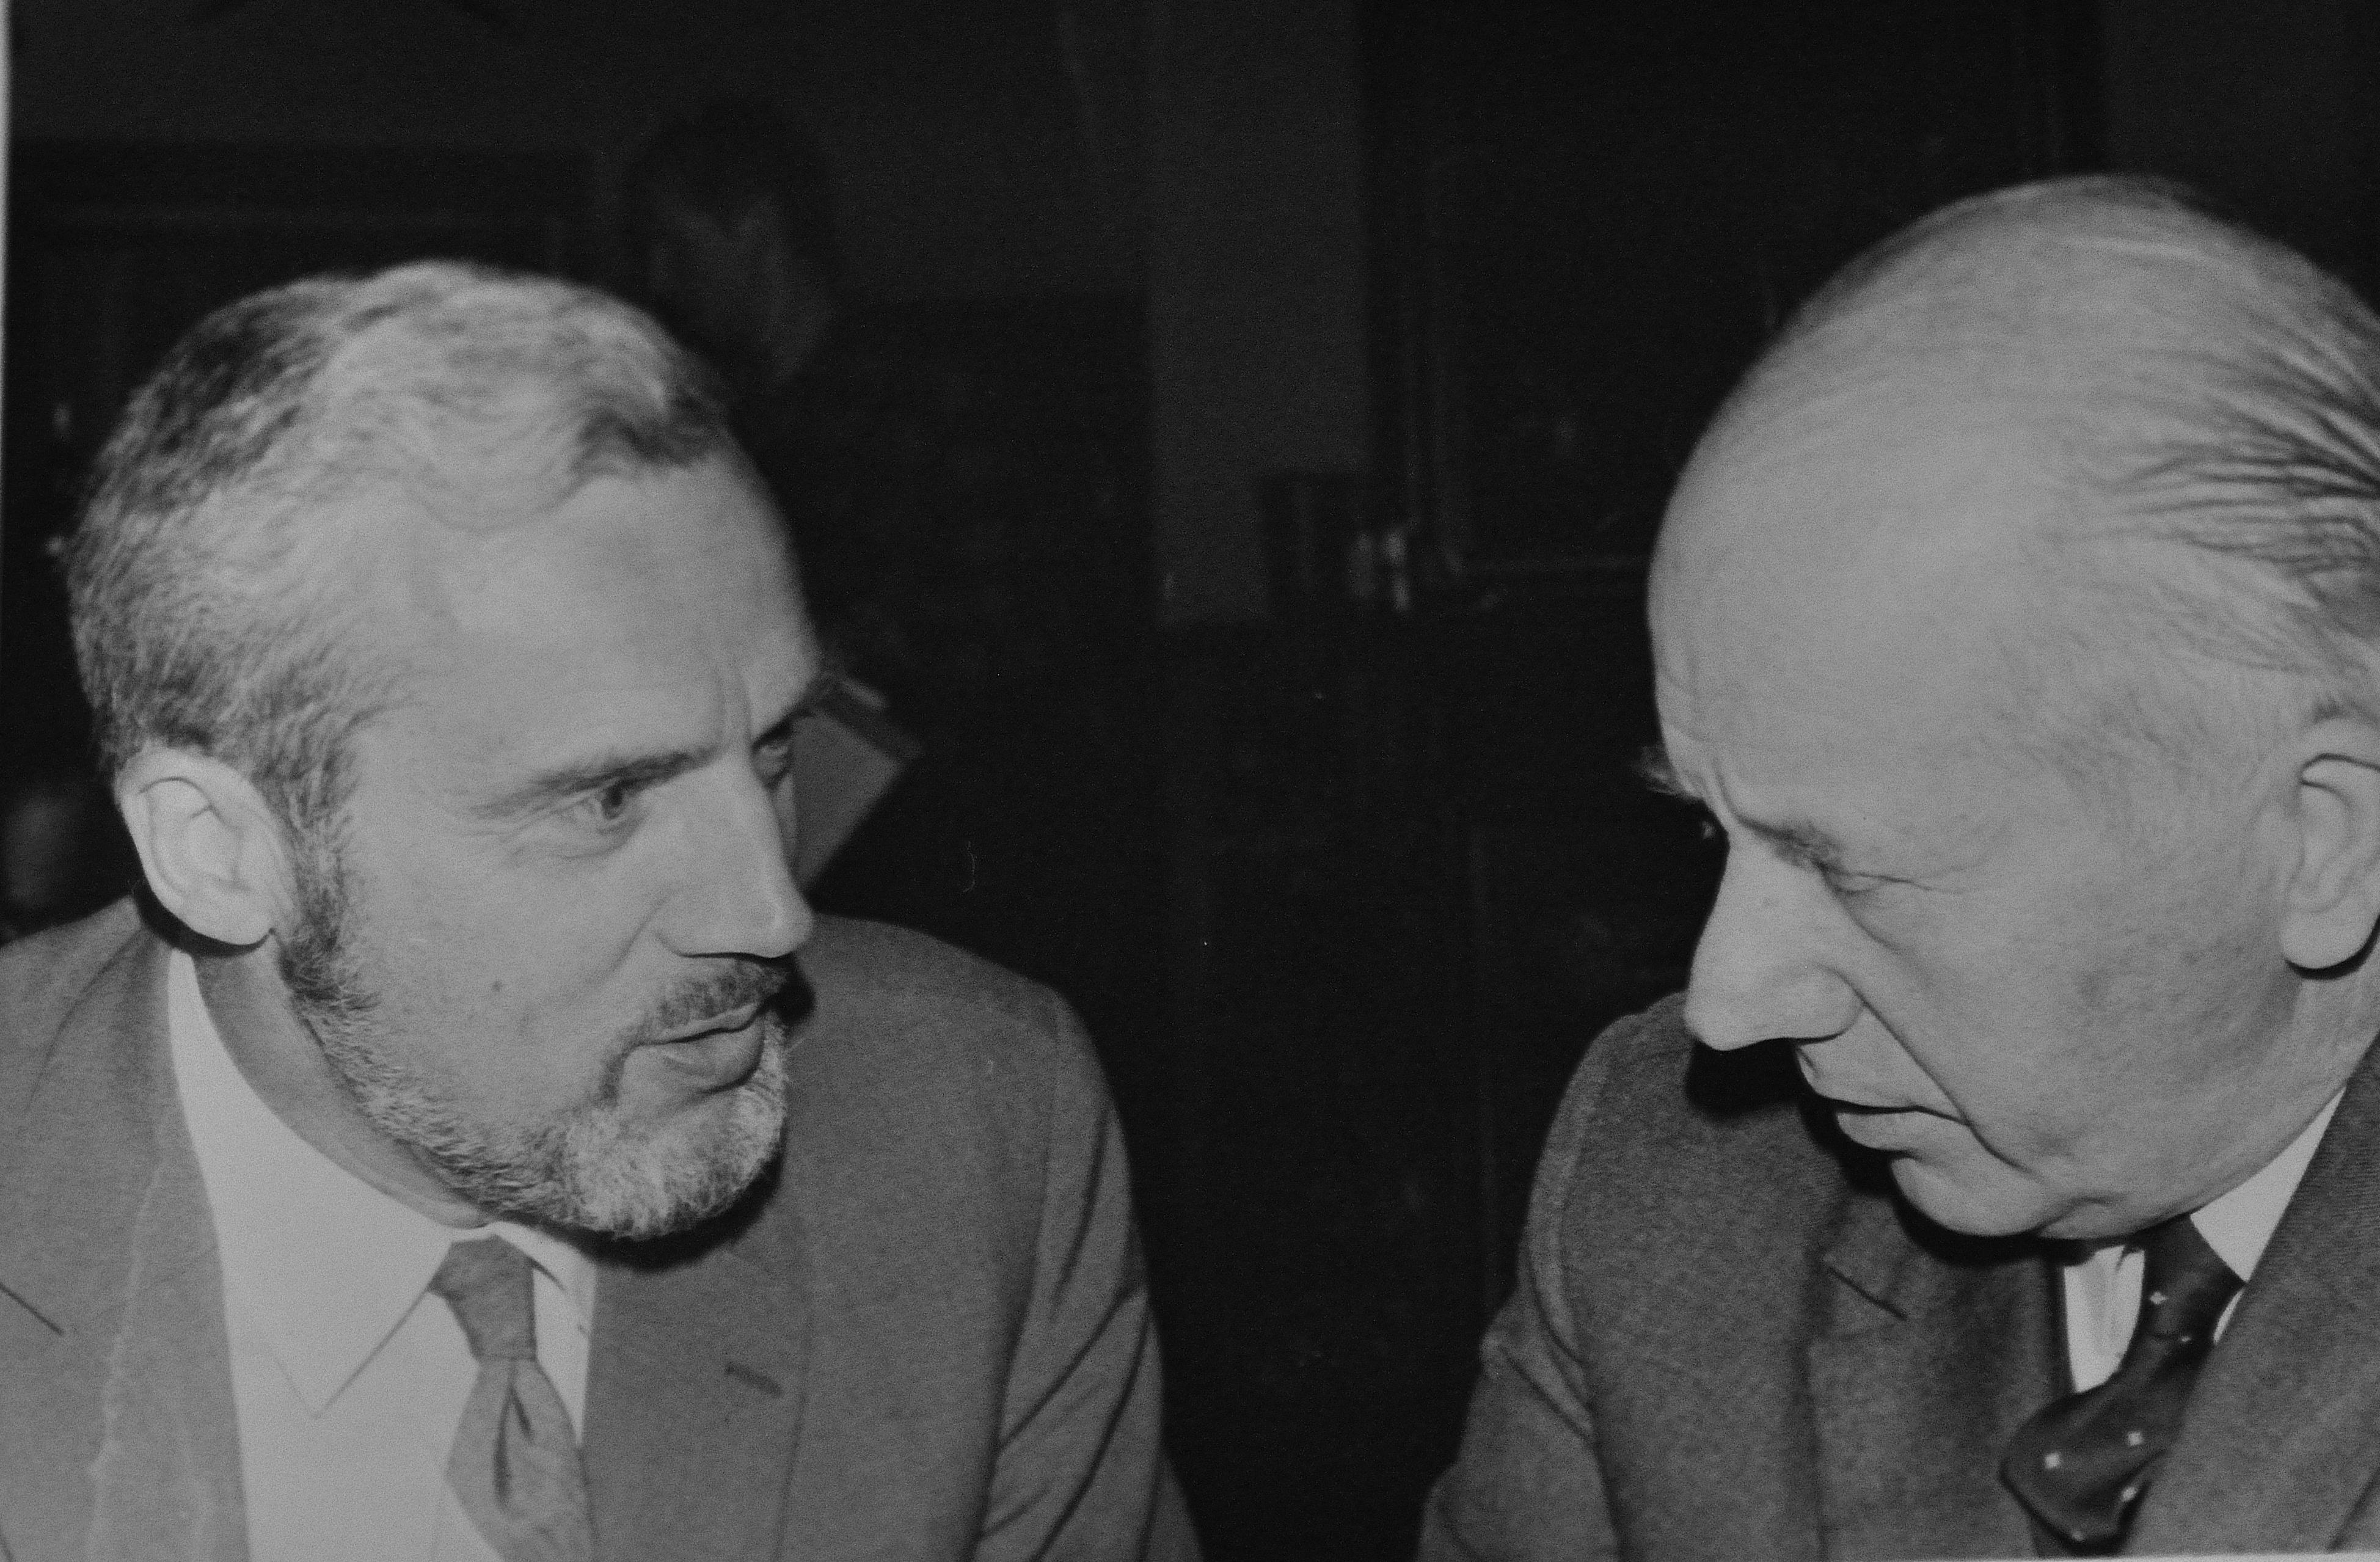 Sven Hagberg och Erik Lundin 1967 - Blasieholmstorg. - Sven_Hagberg_Erik_Lundin_1967